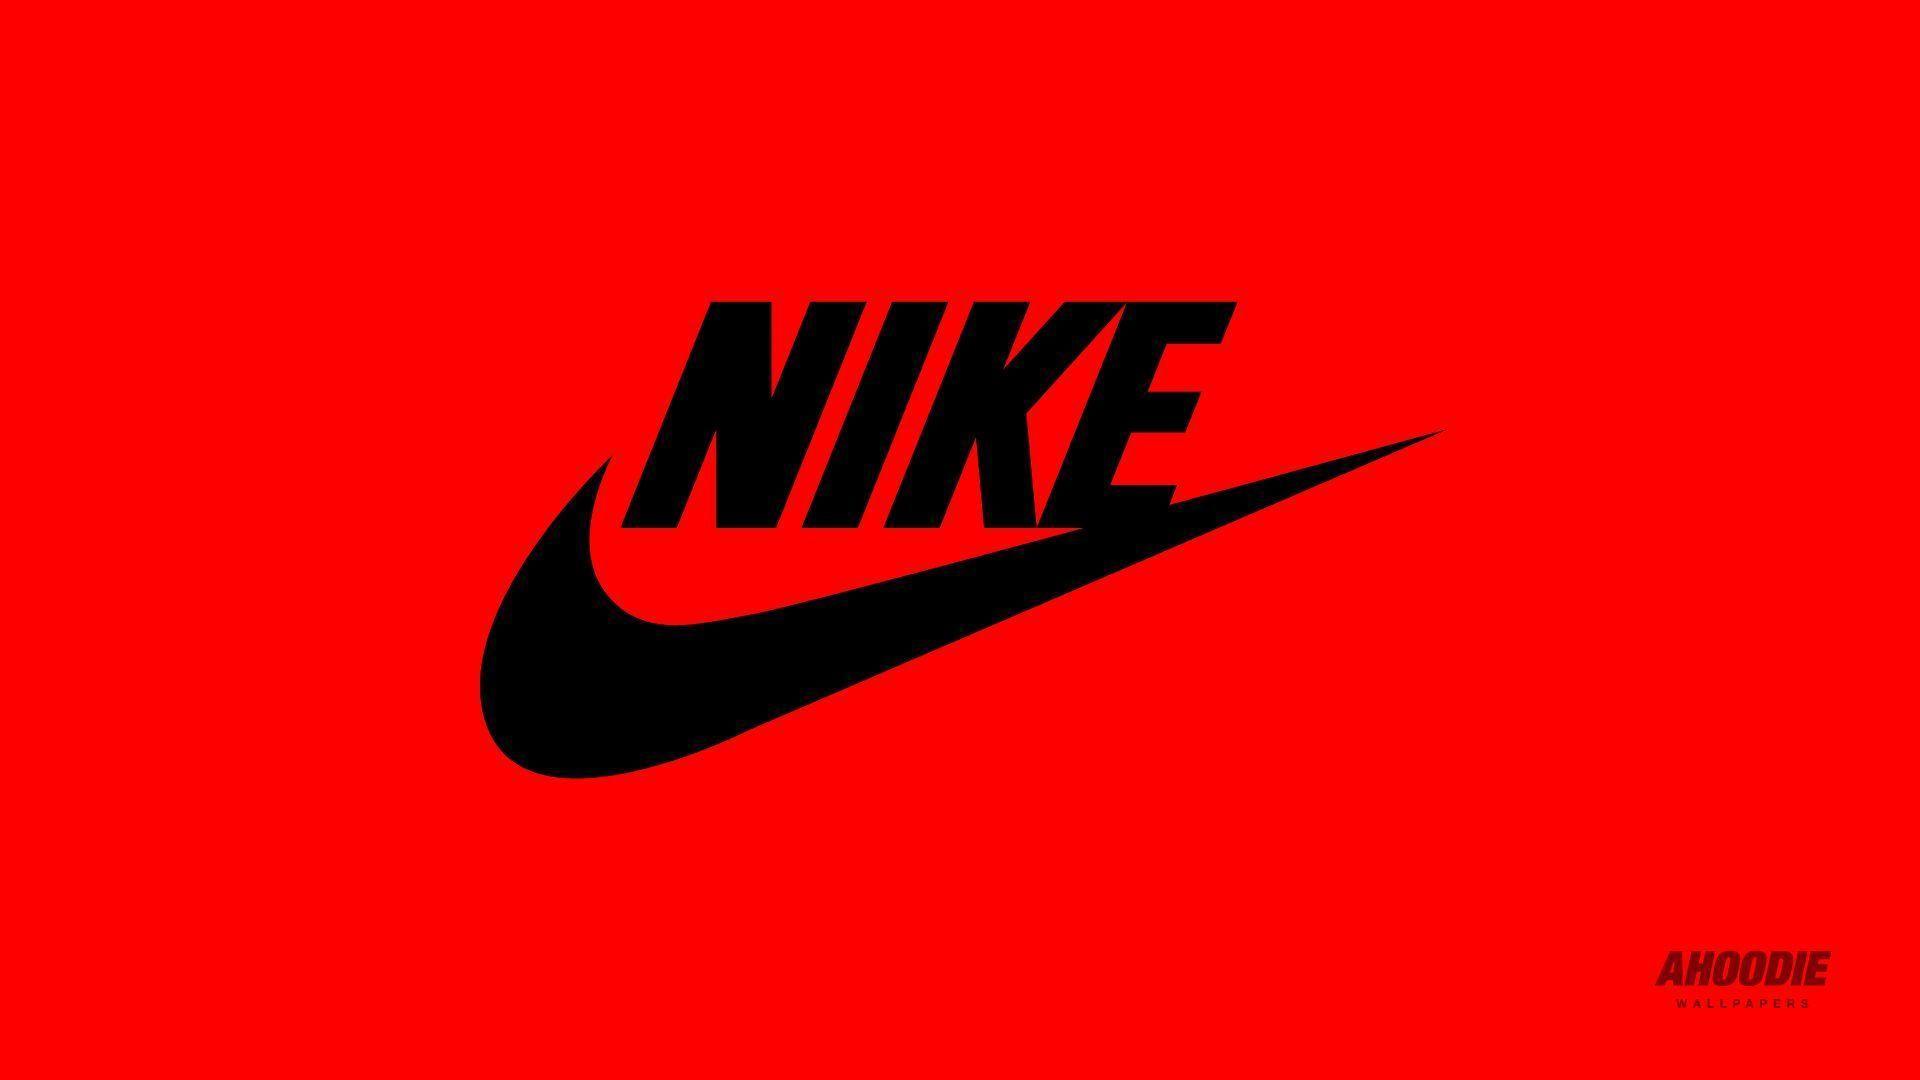 Top Wallpaper Macbook Nike - mAz5V5c  2018_101734.jpg